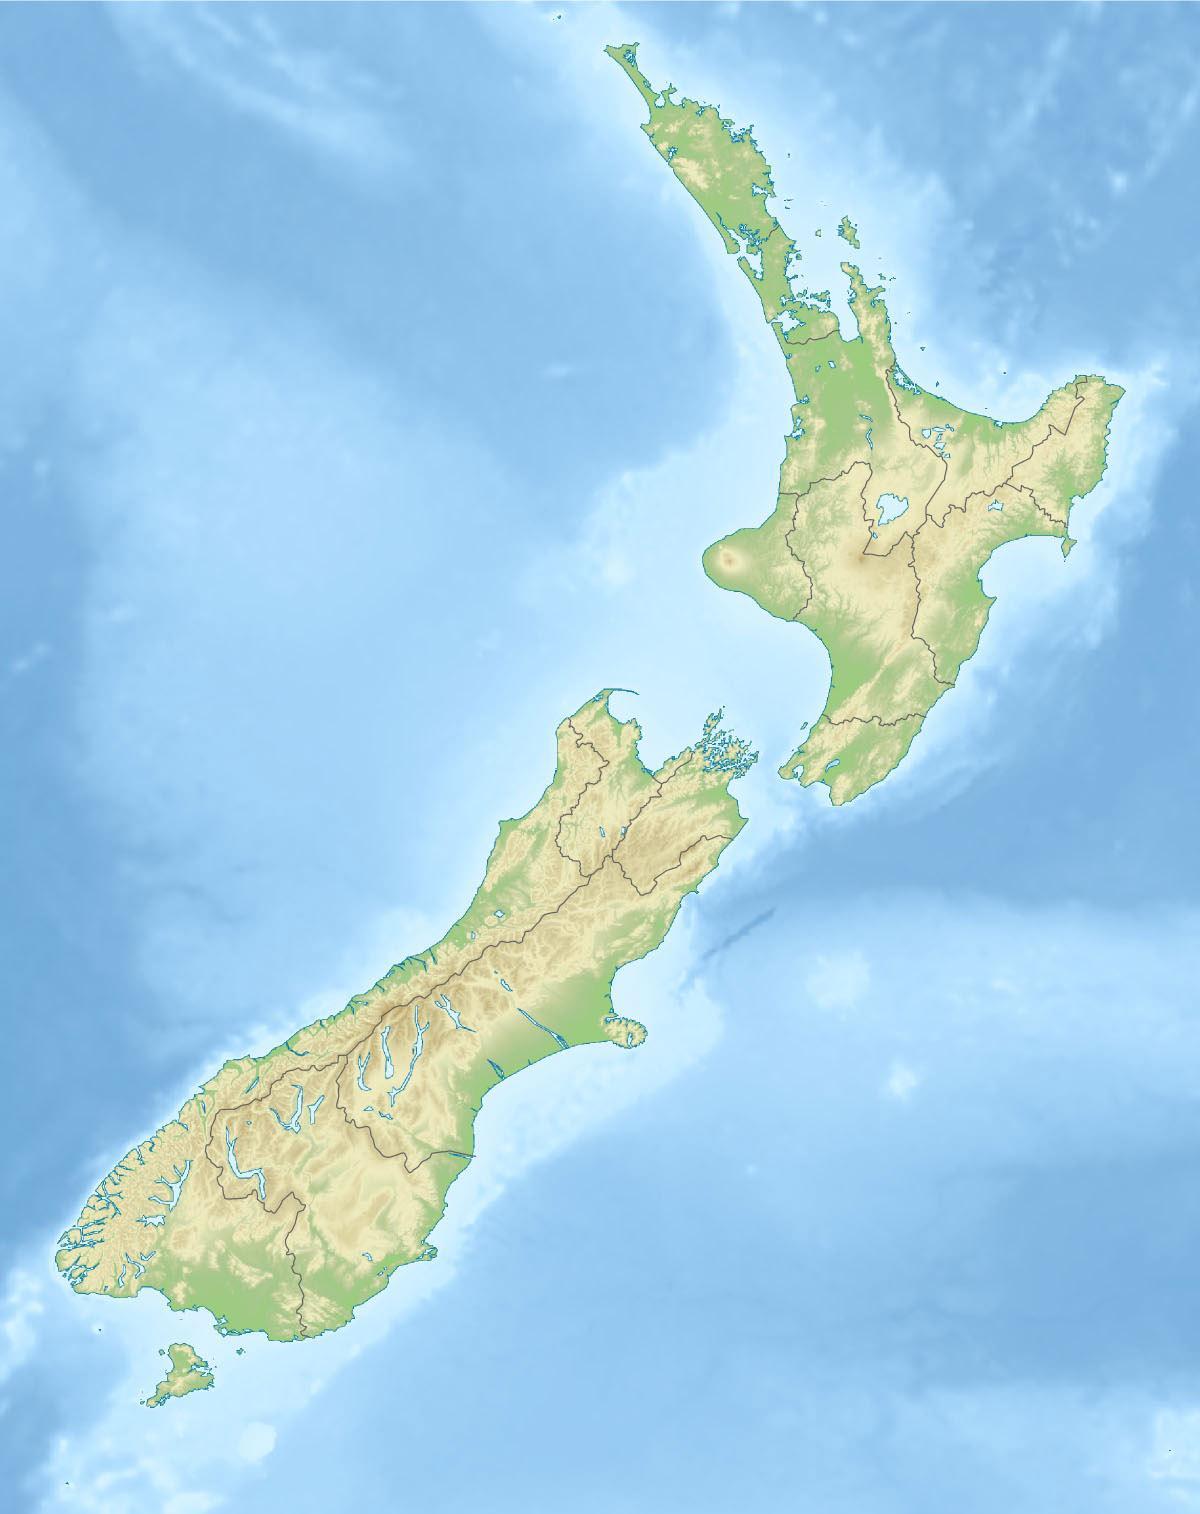 Neuseeland Physische Karte Neu Seeland Physikalischen